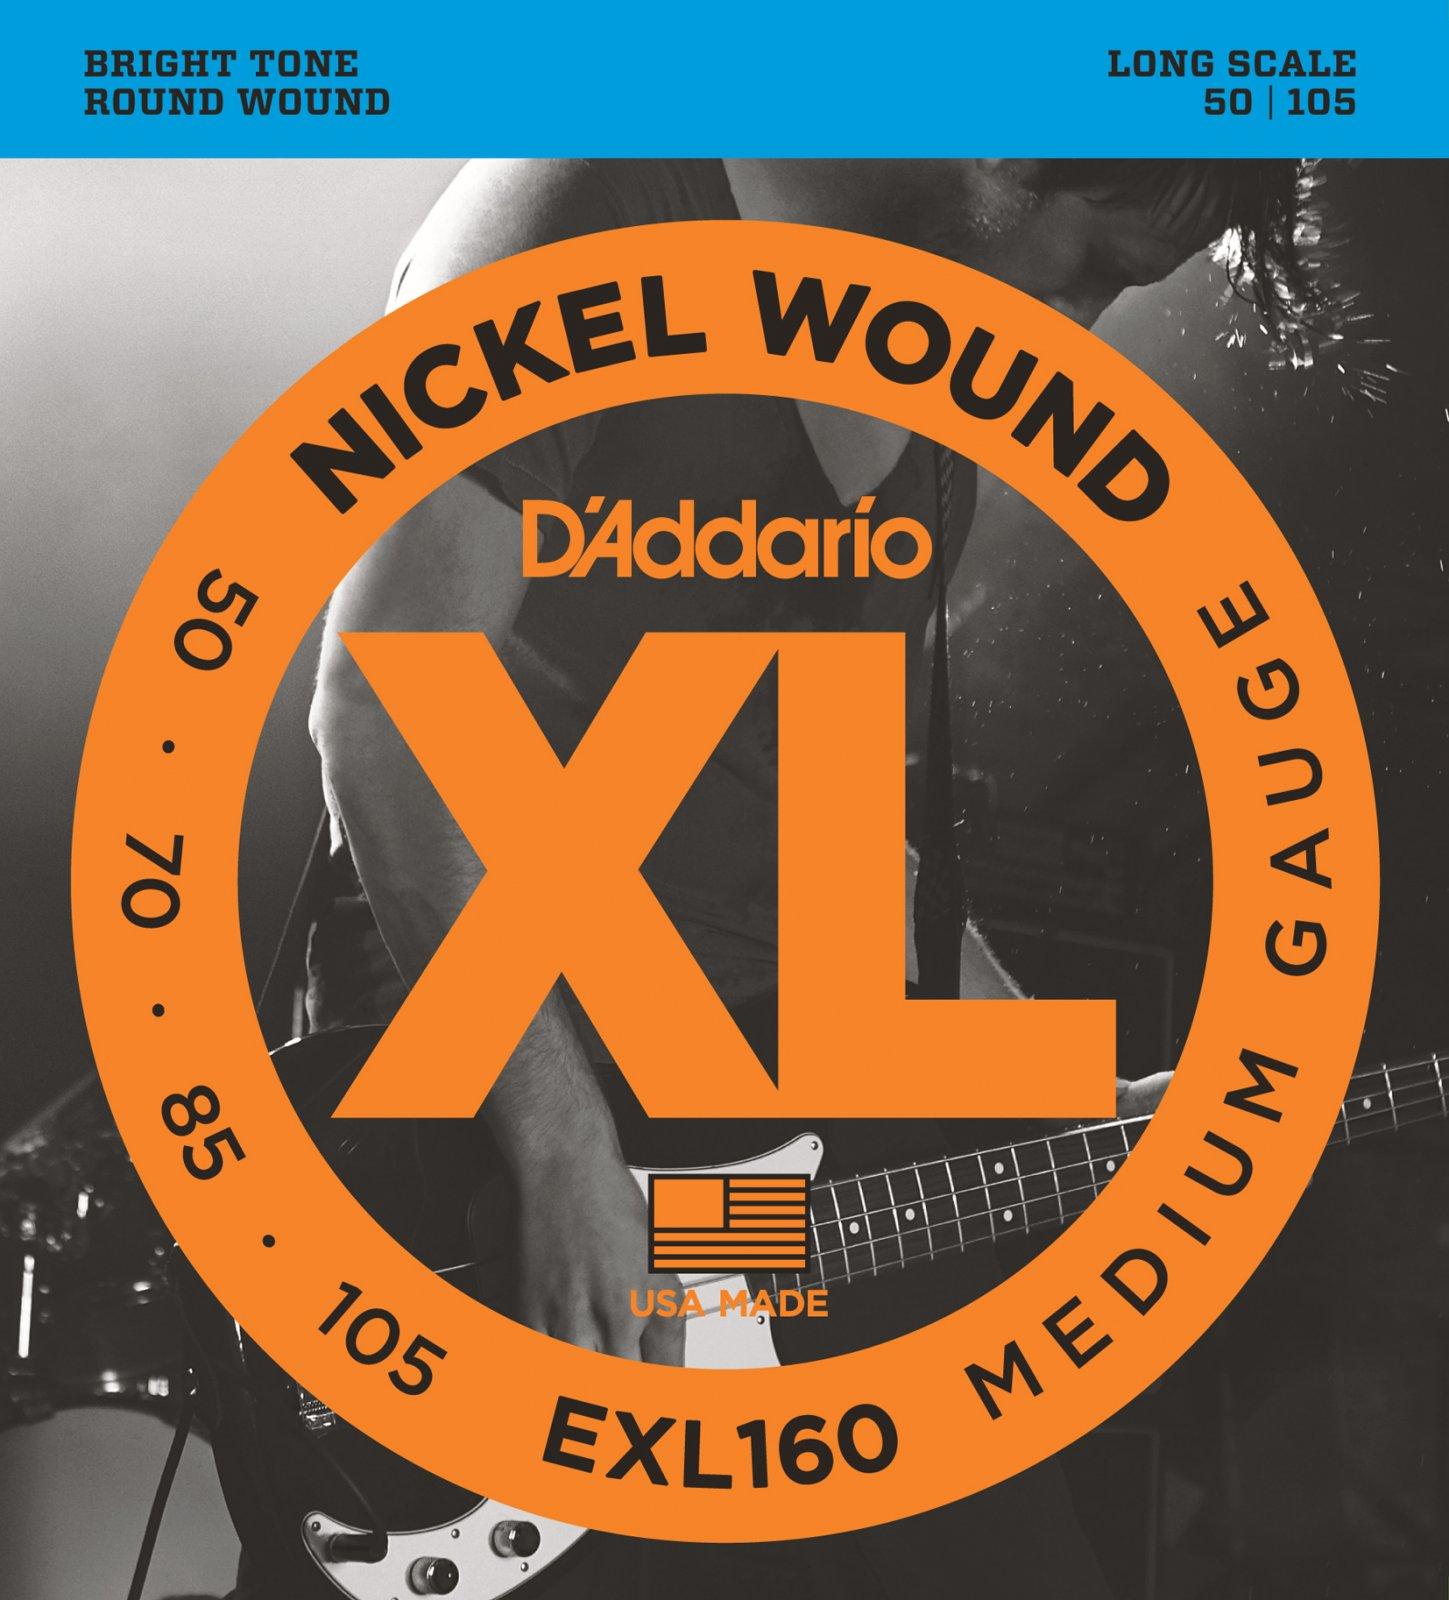 D'Addario EXL160 Nickel Wound Bass Guitar Strings - Medium, 50-105,  Long Scale